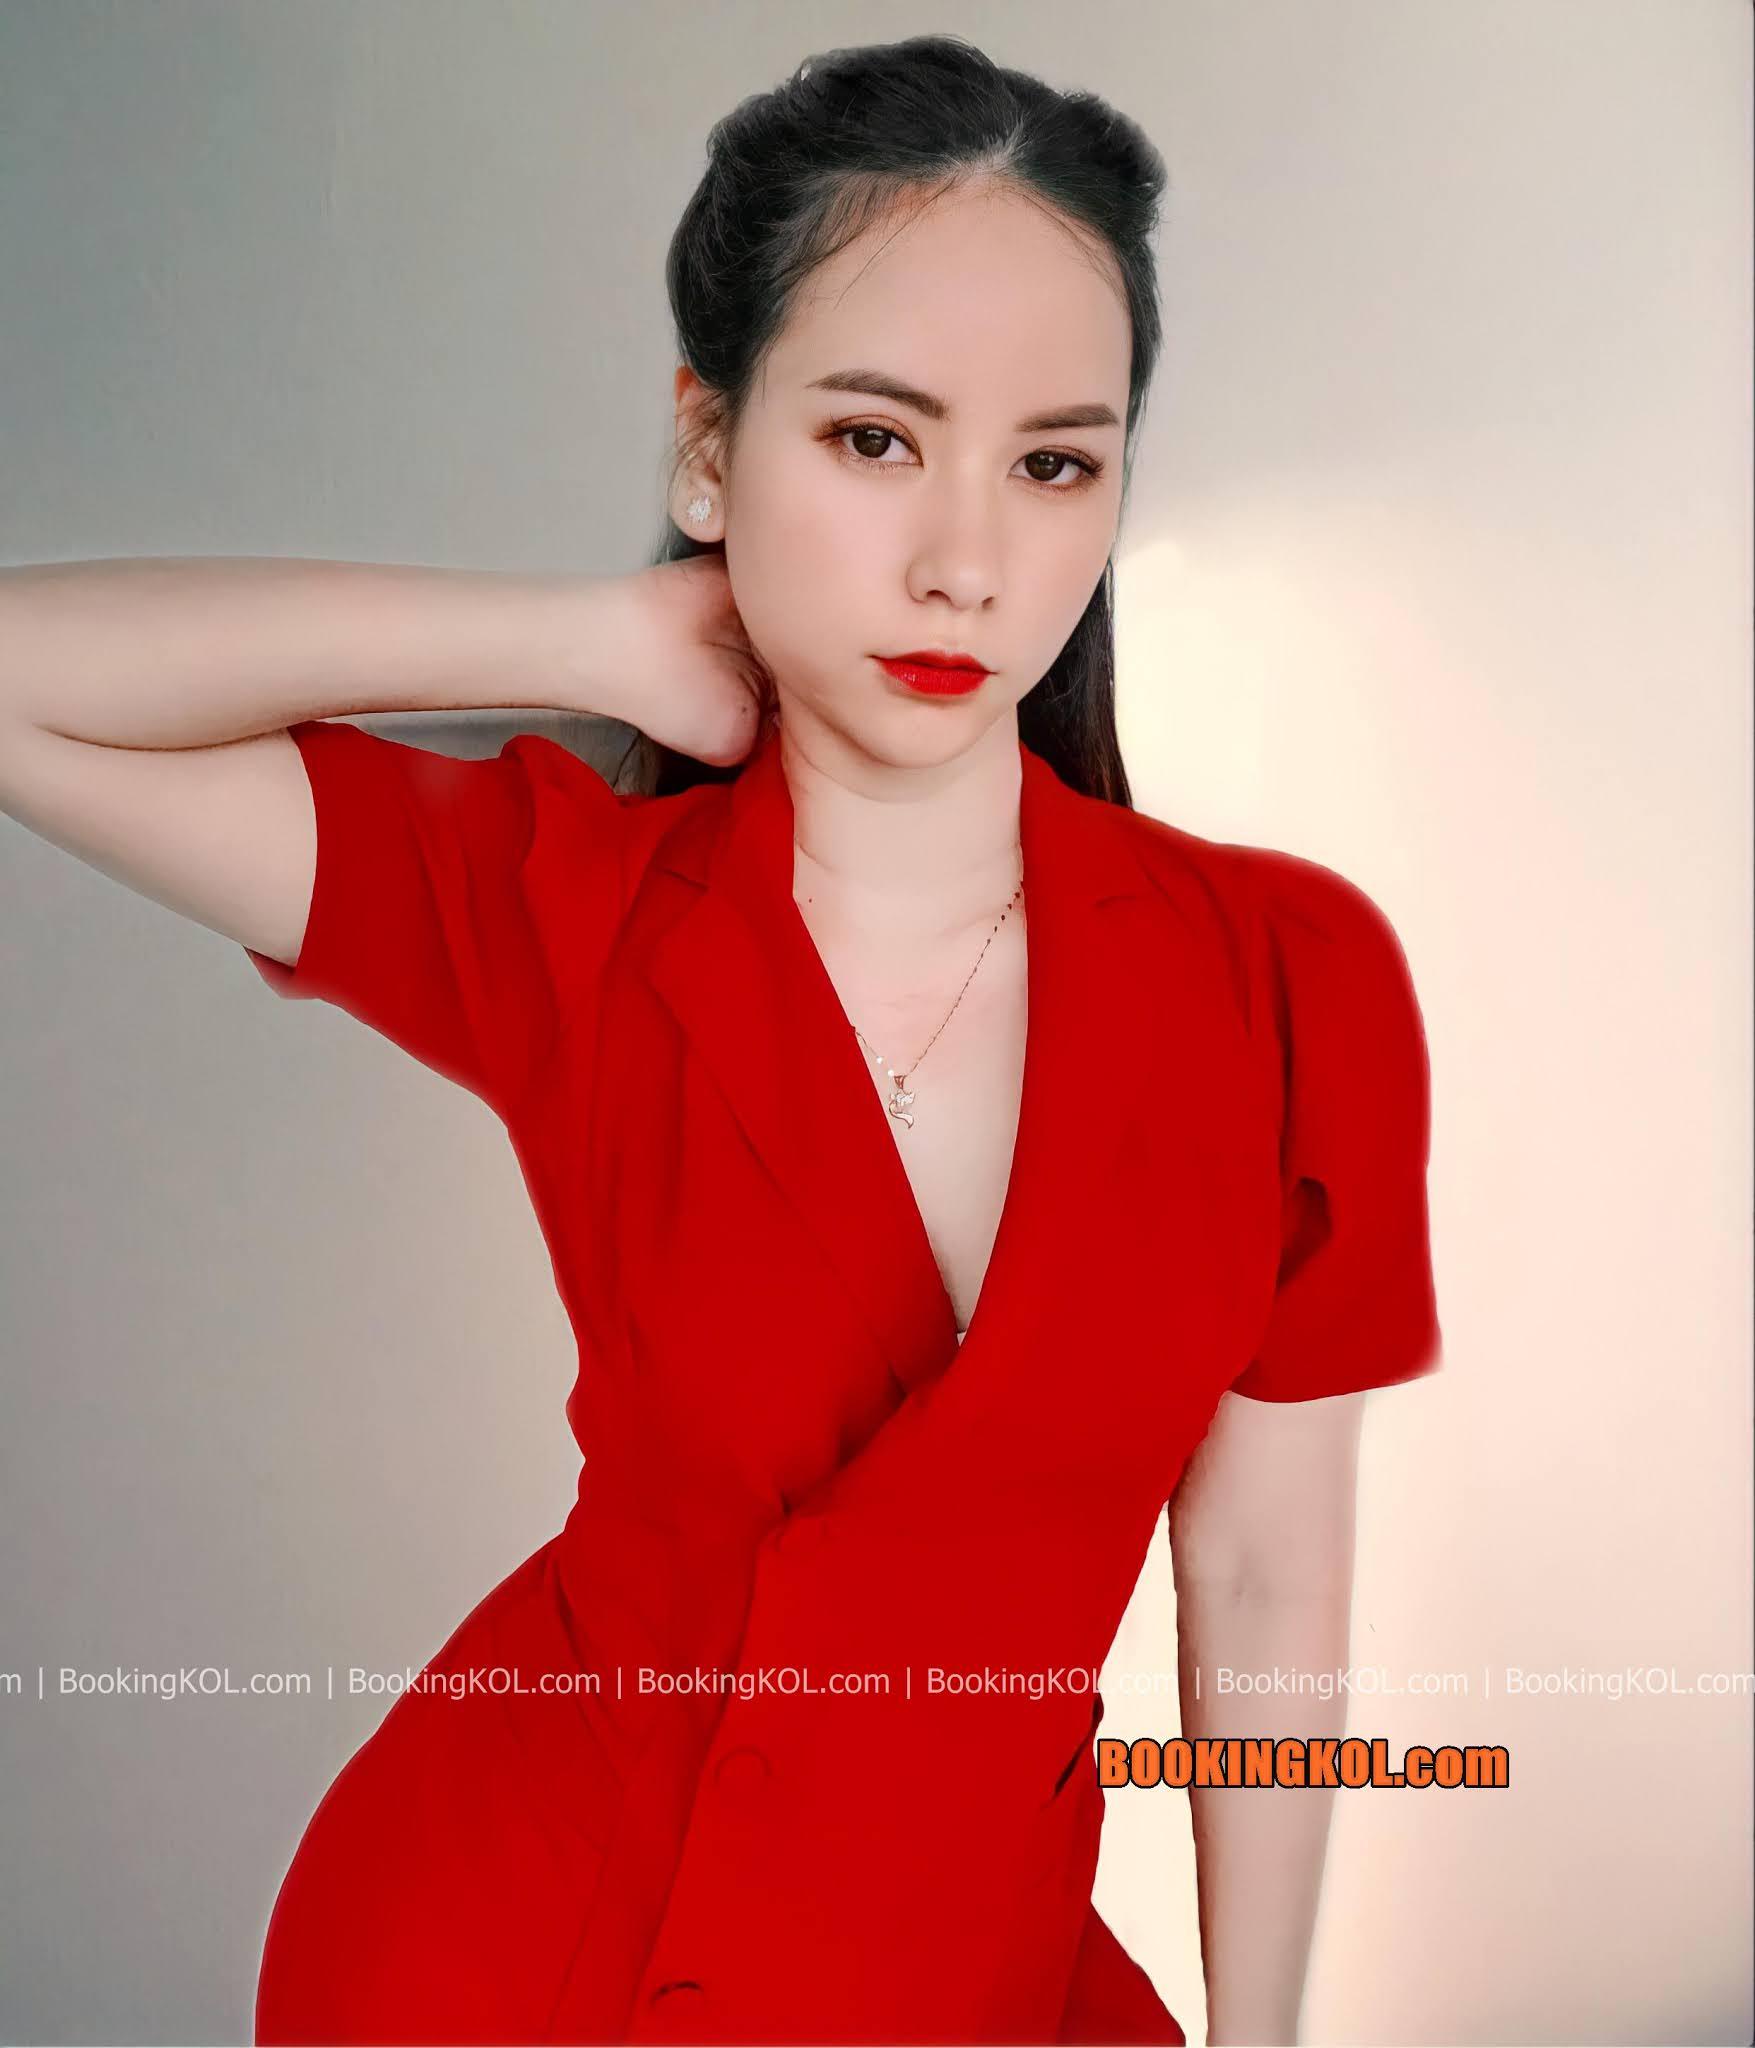 Cherry Sam - Thanh Minh